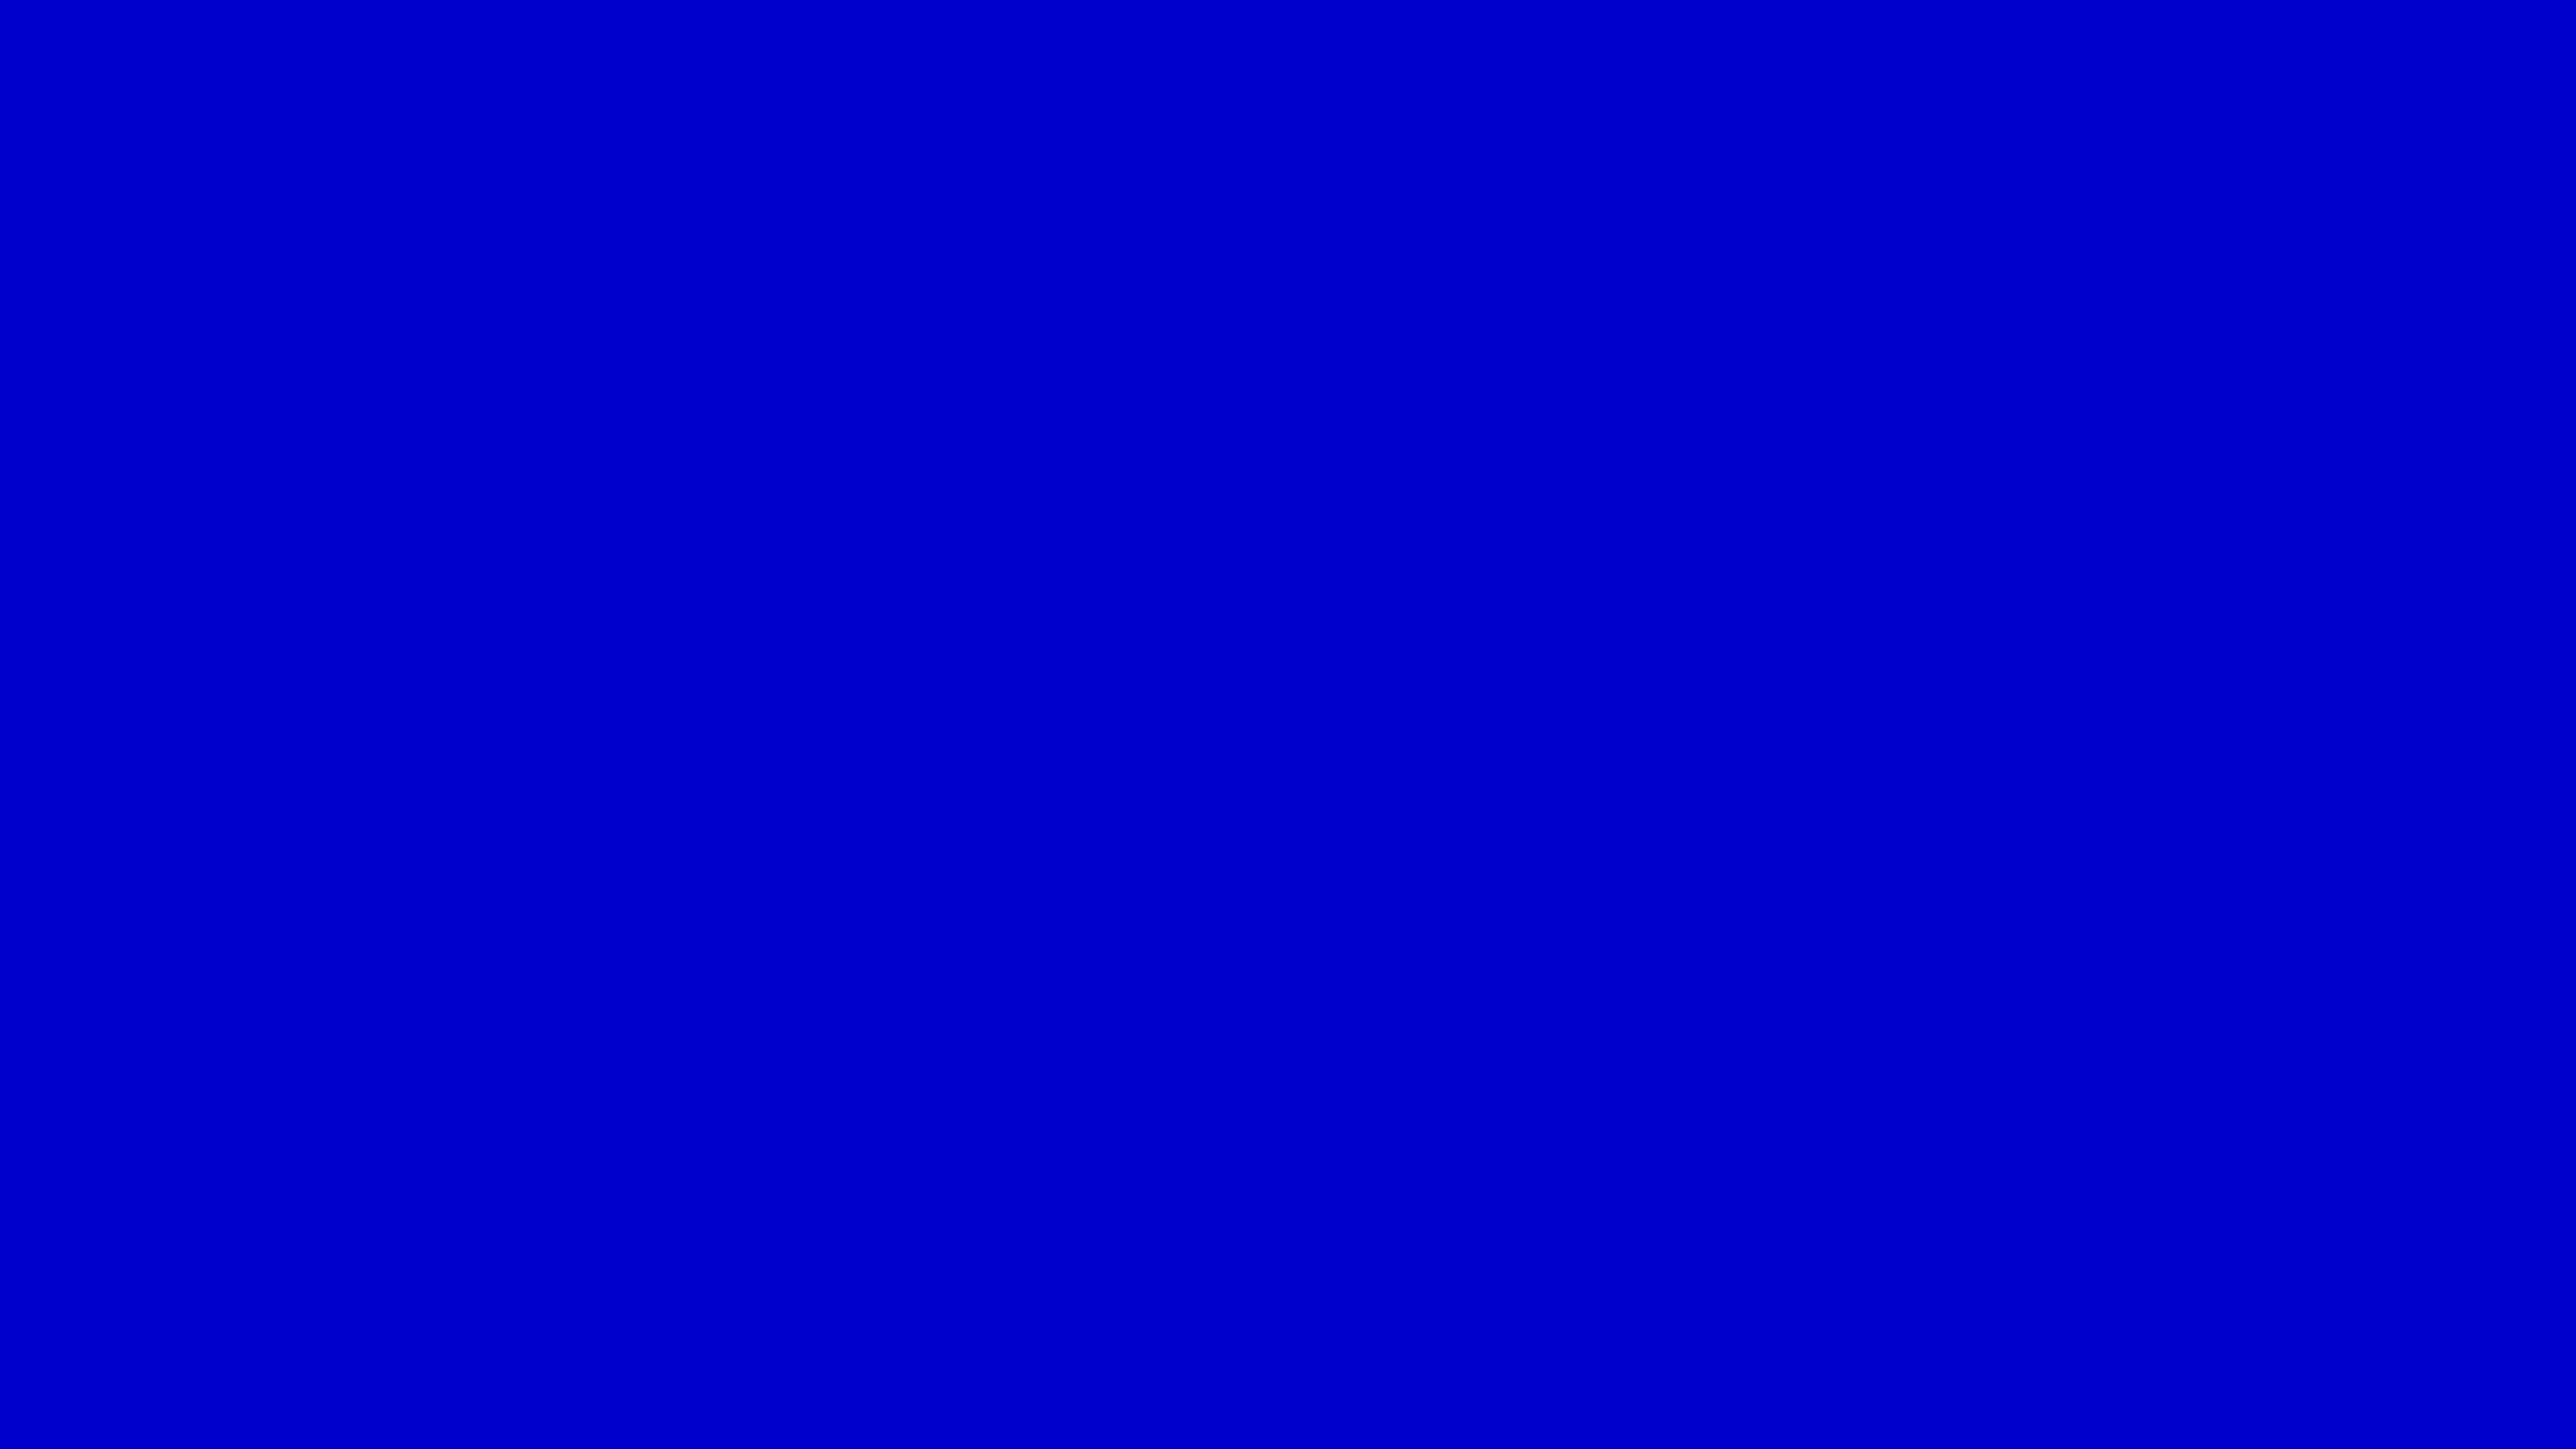 4096x2304 Medium Blue Solid Color Background